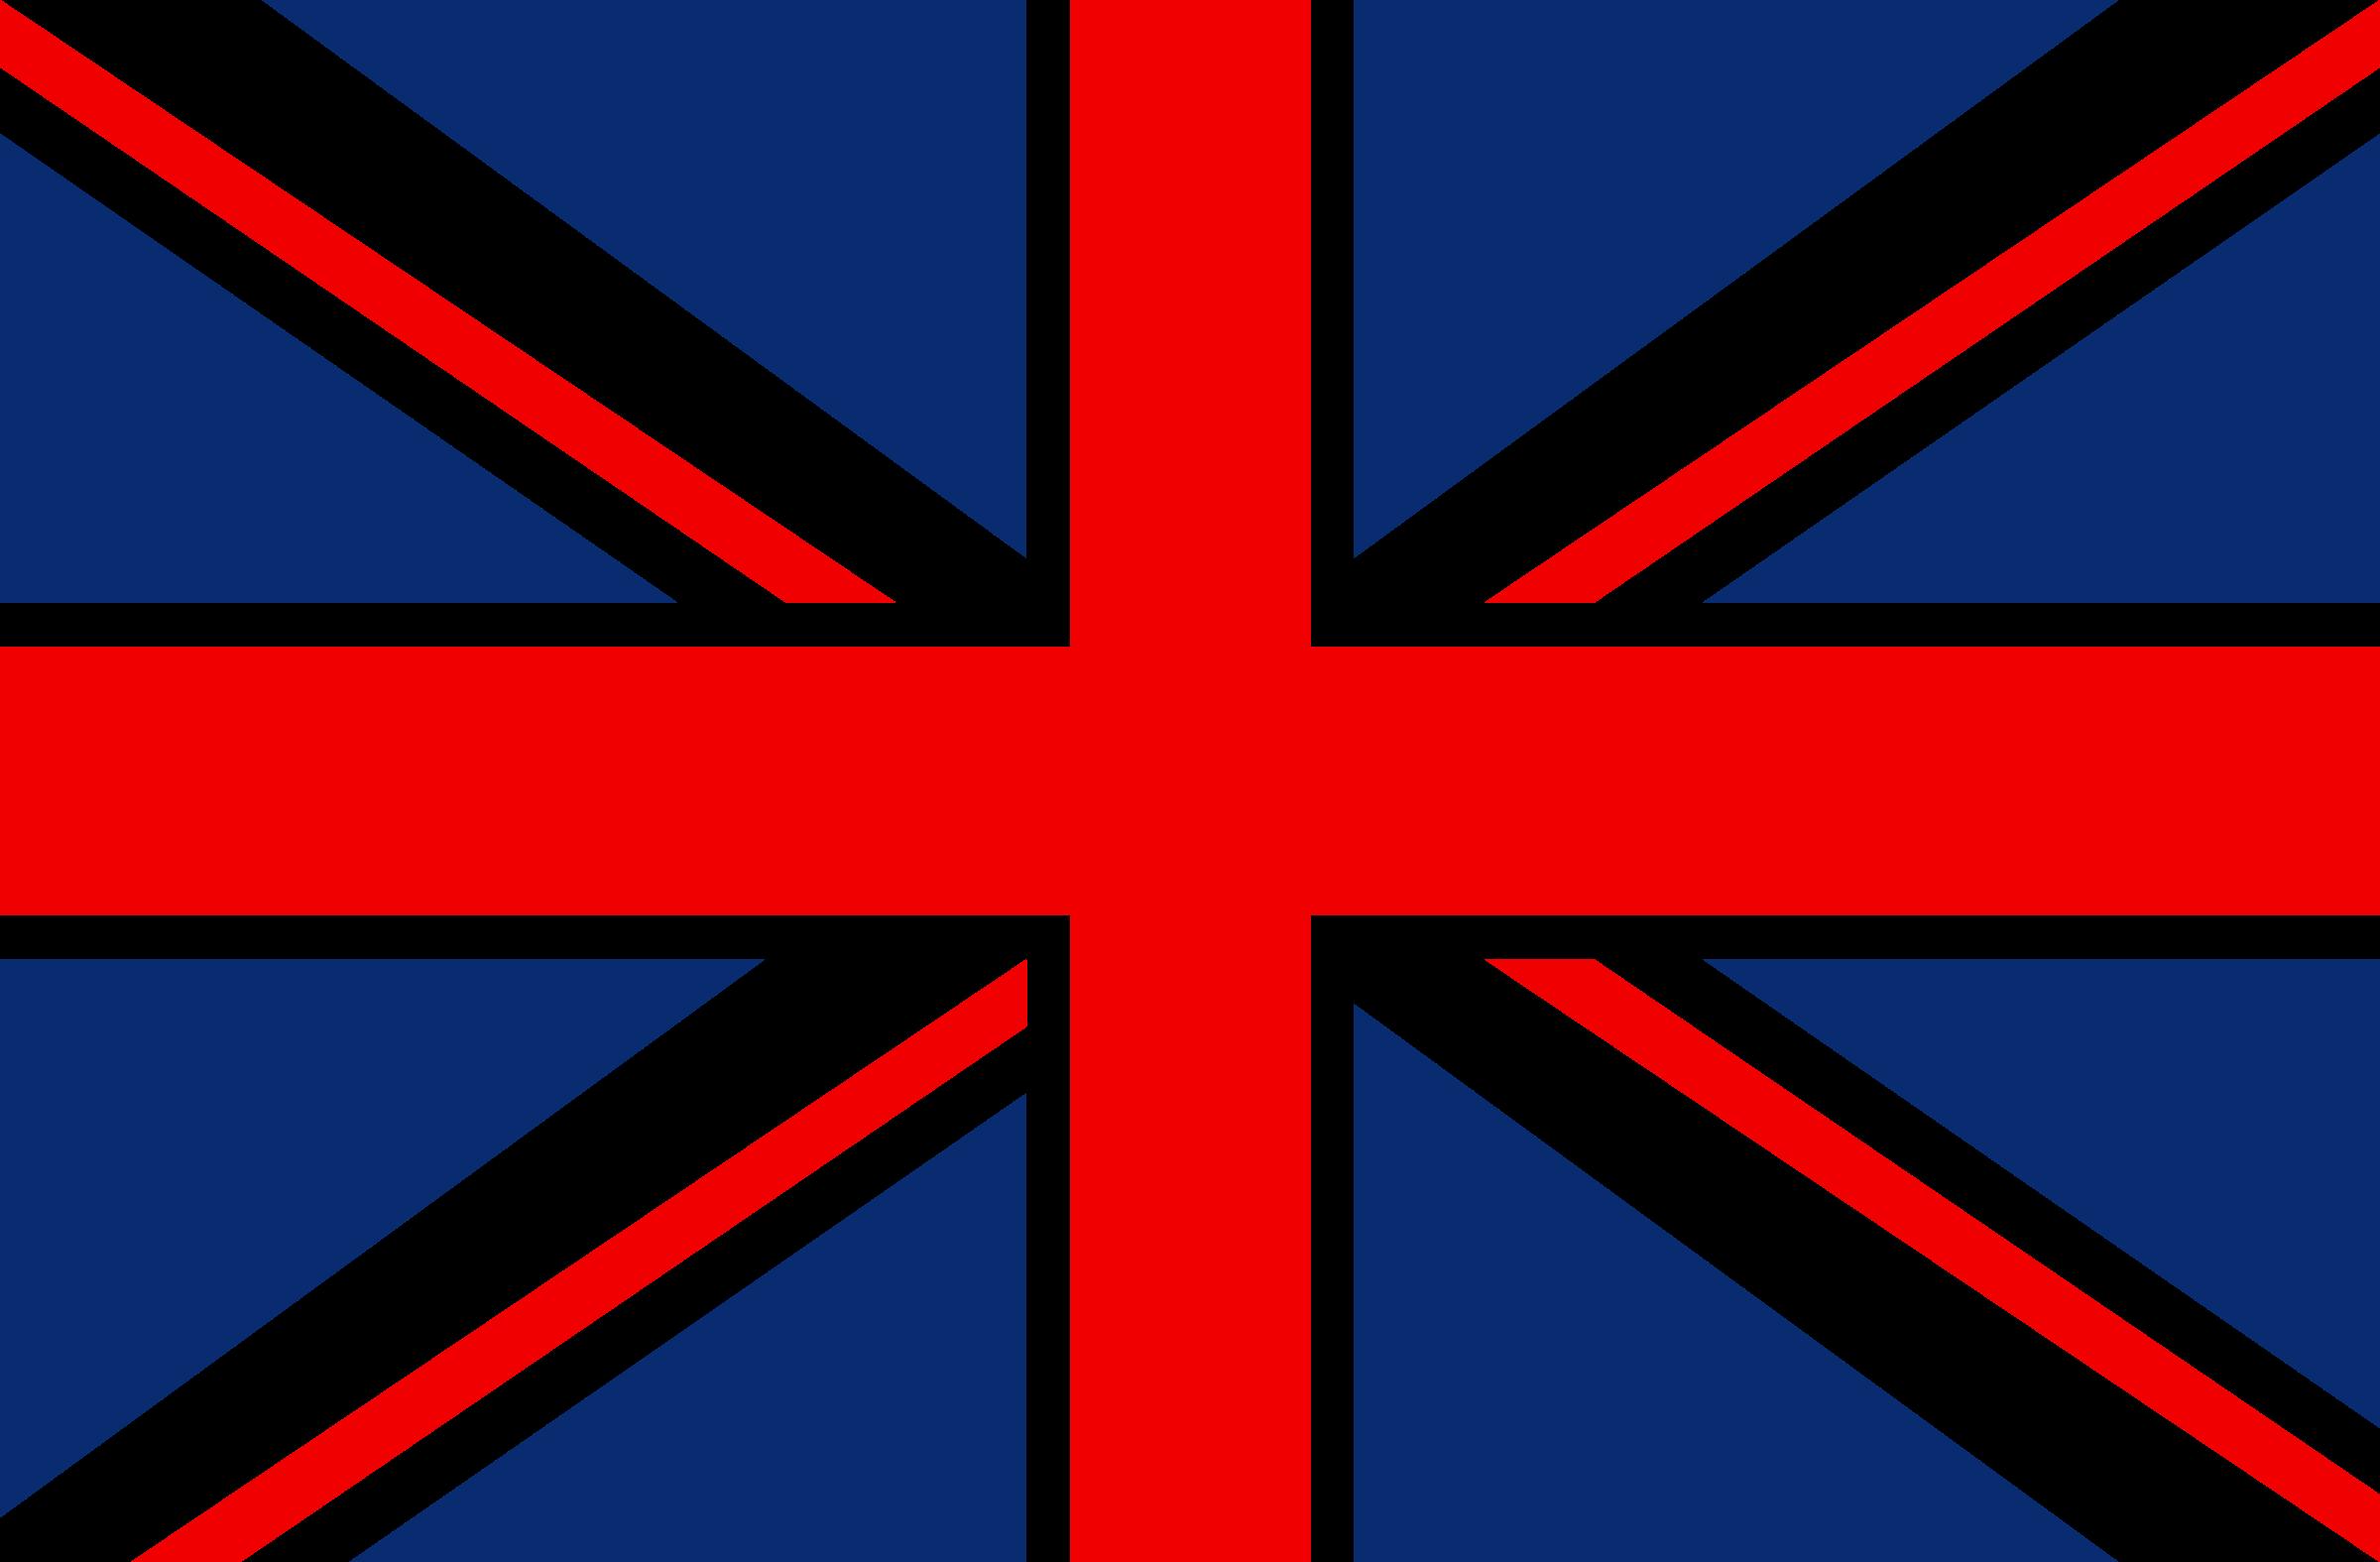 Wersja angielska